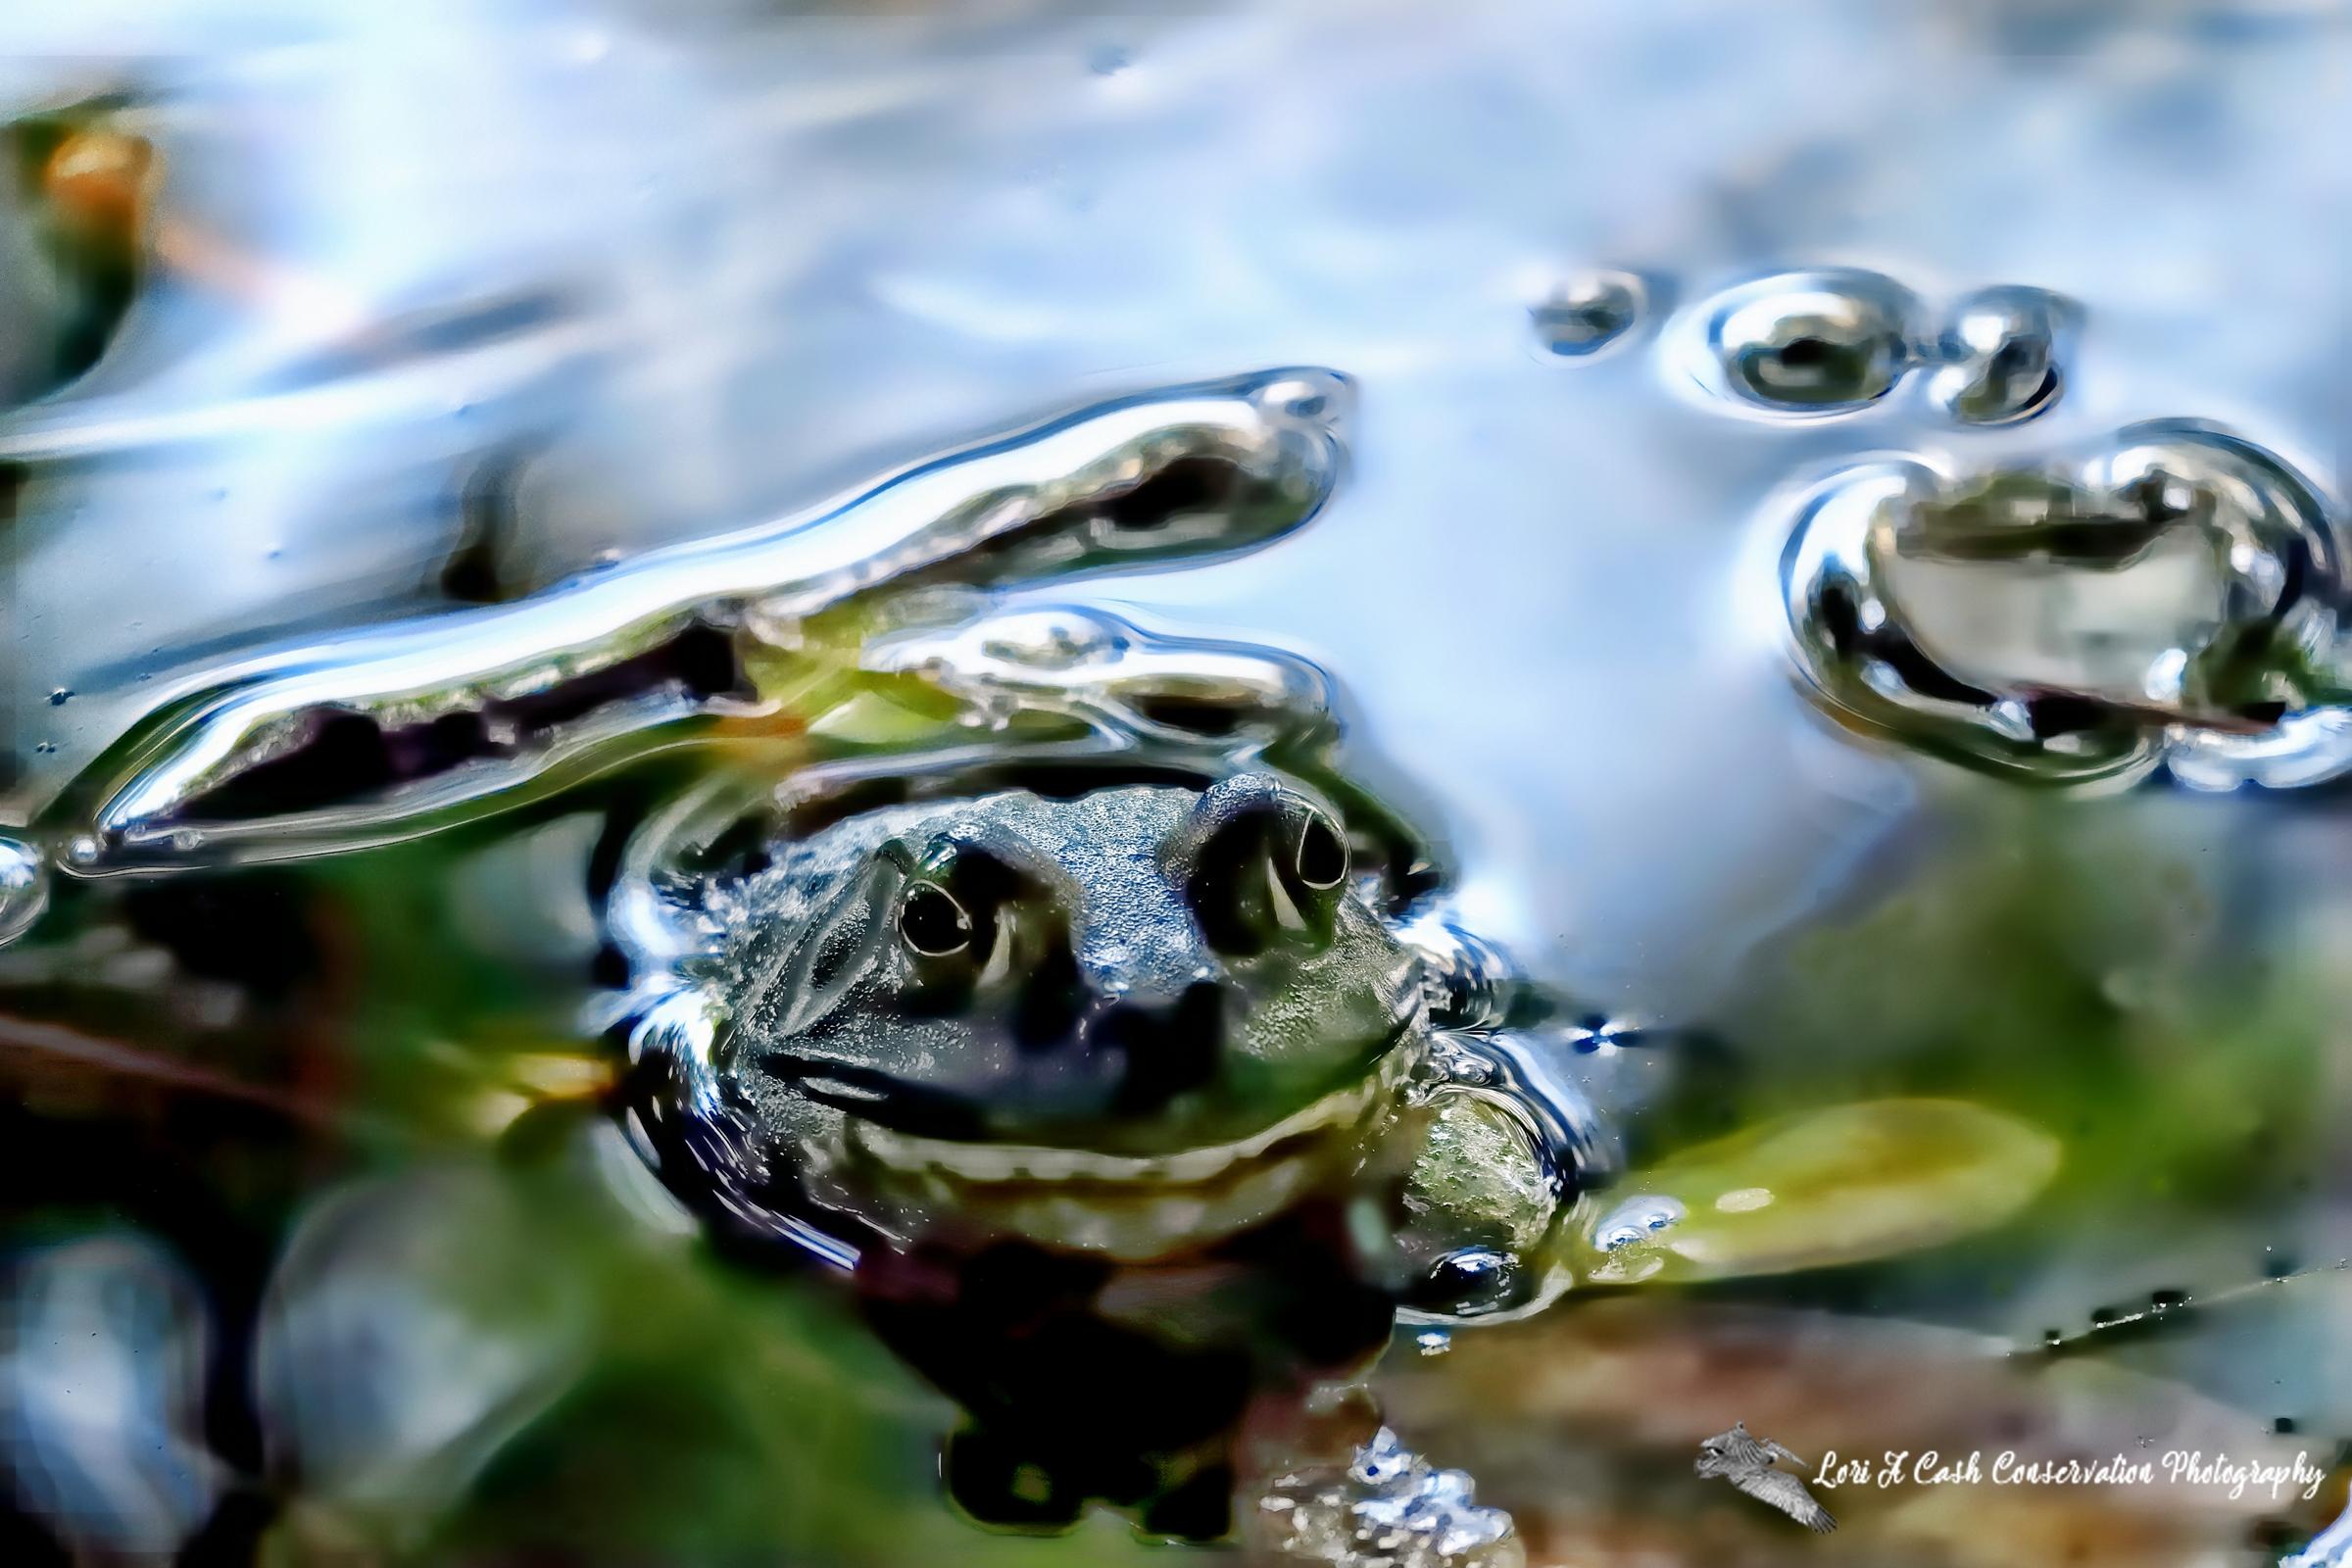 American bullfrog floating in the pond among leaves at Norfolk Botanical Garden in Norfolk, Virginia.